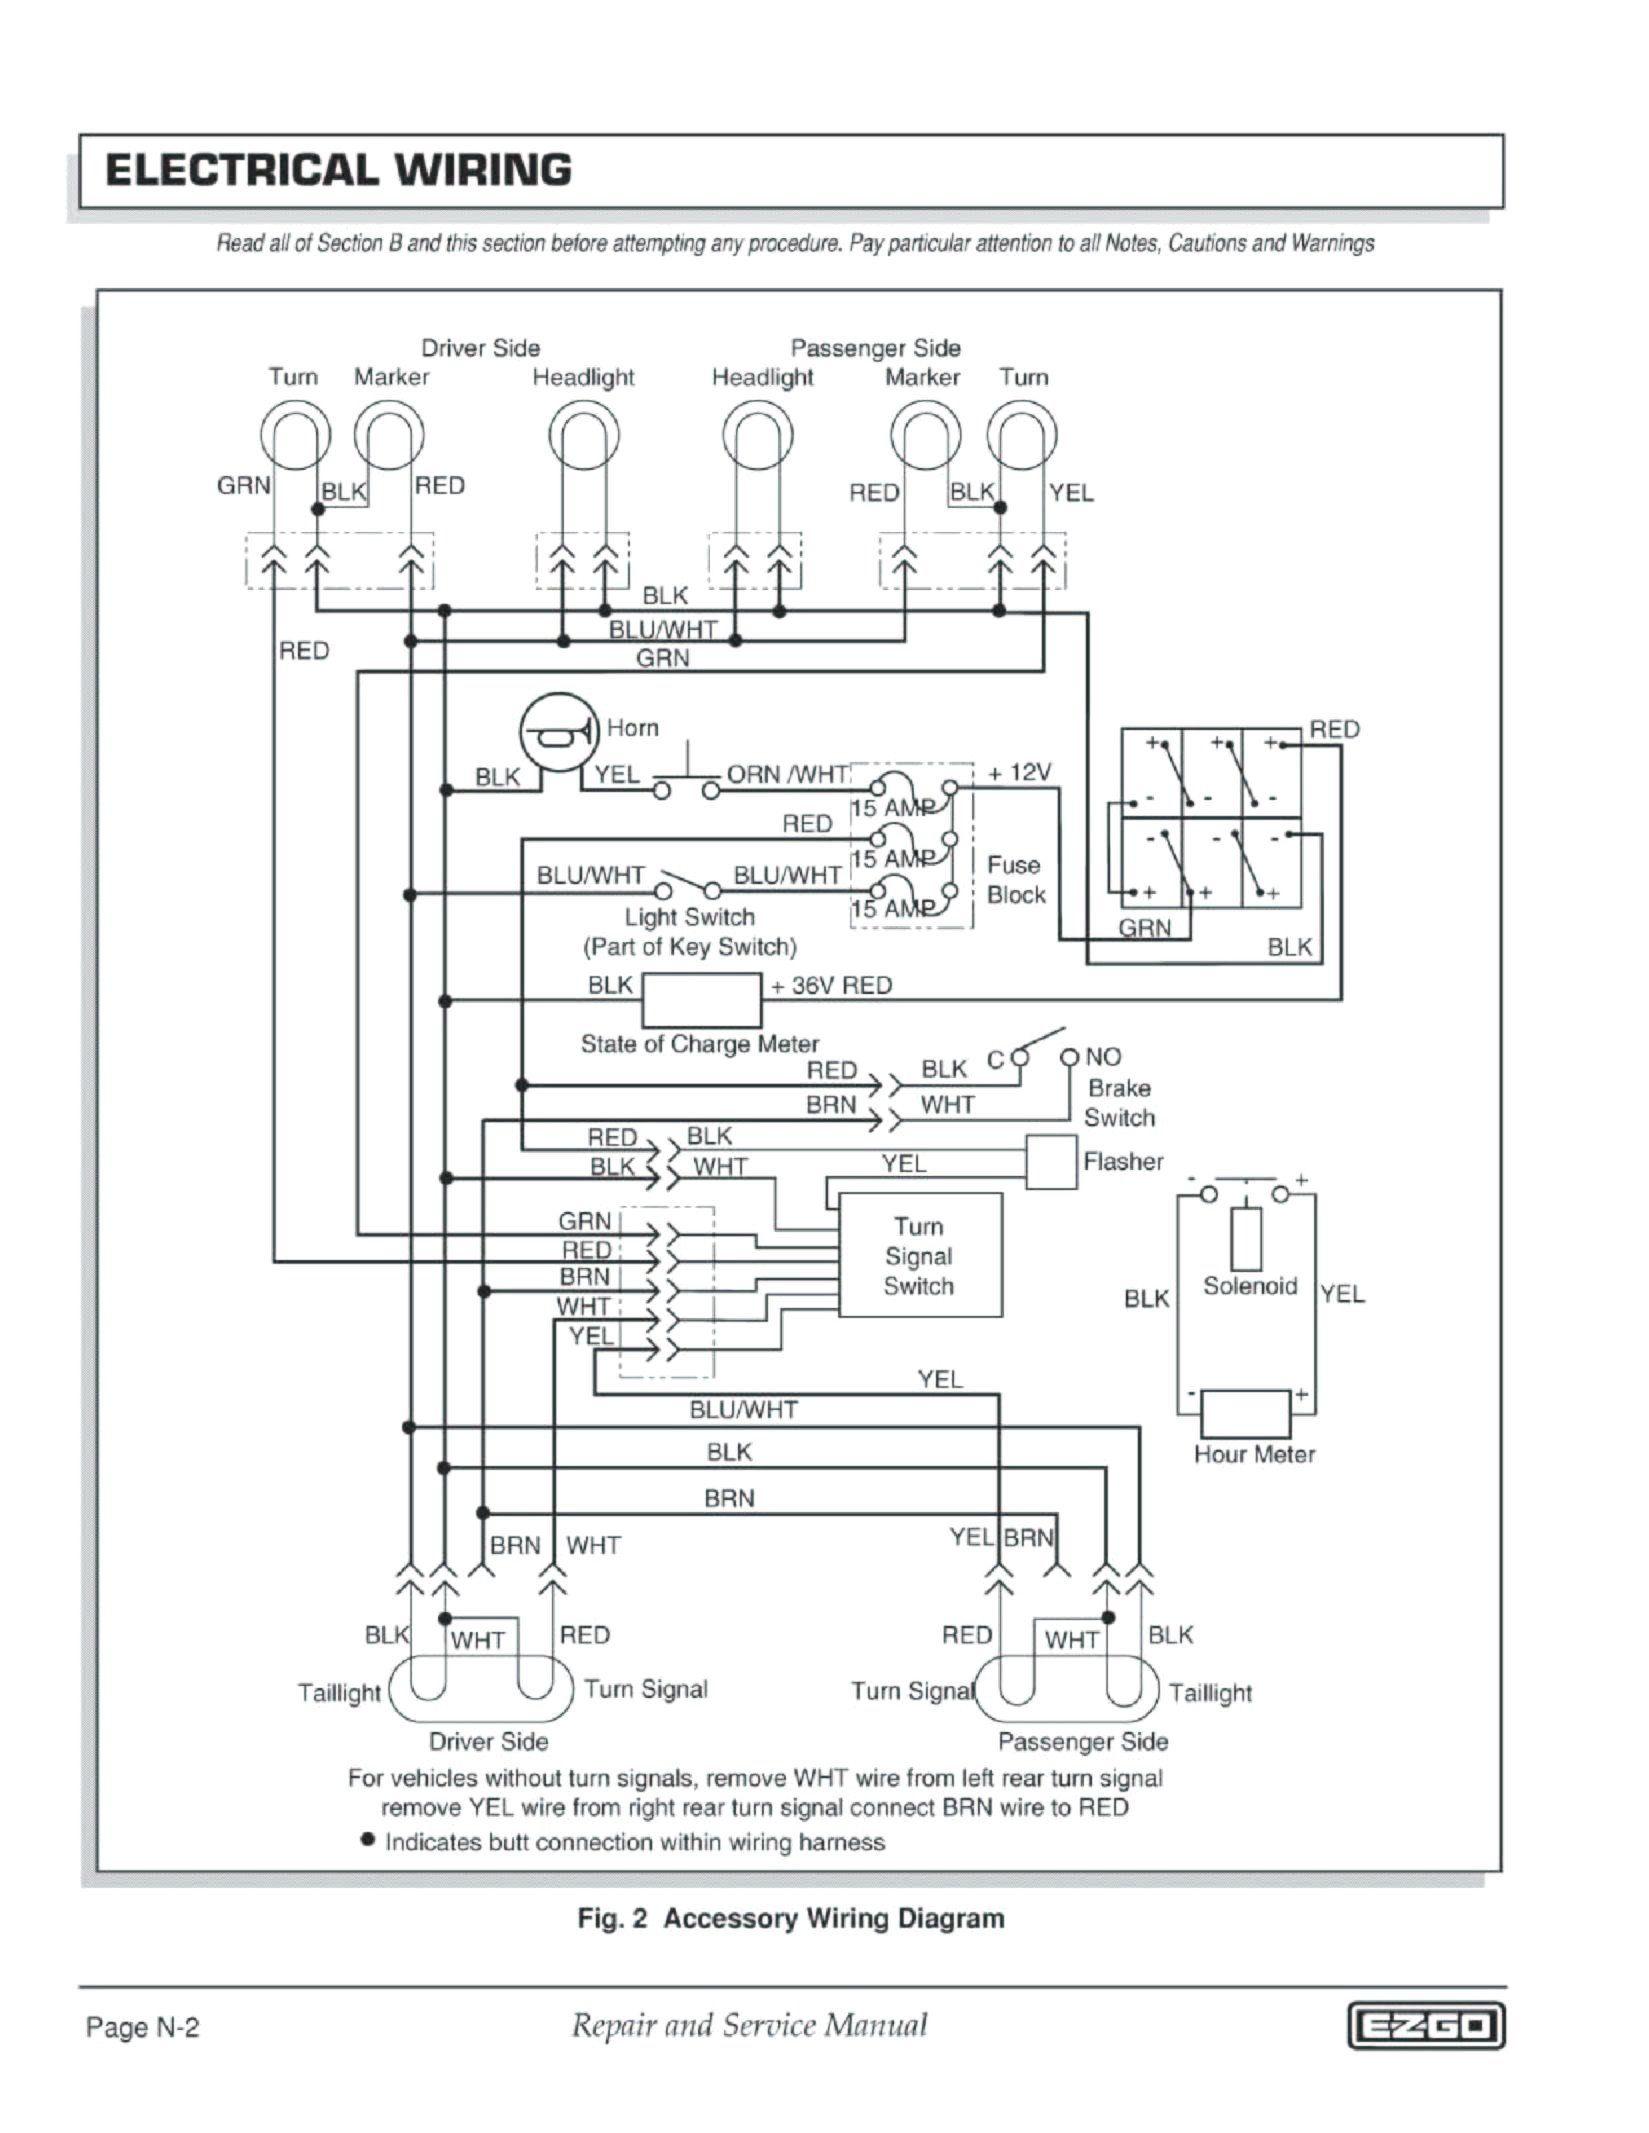 123 golight wiring diagram acousticguitarguide in excellent 12 volt switch wiring diagram go light wiring diagram [ 1649 x 2133 Pixel ]